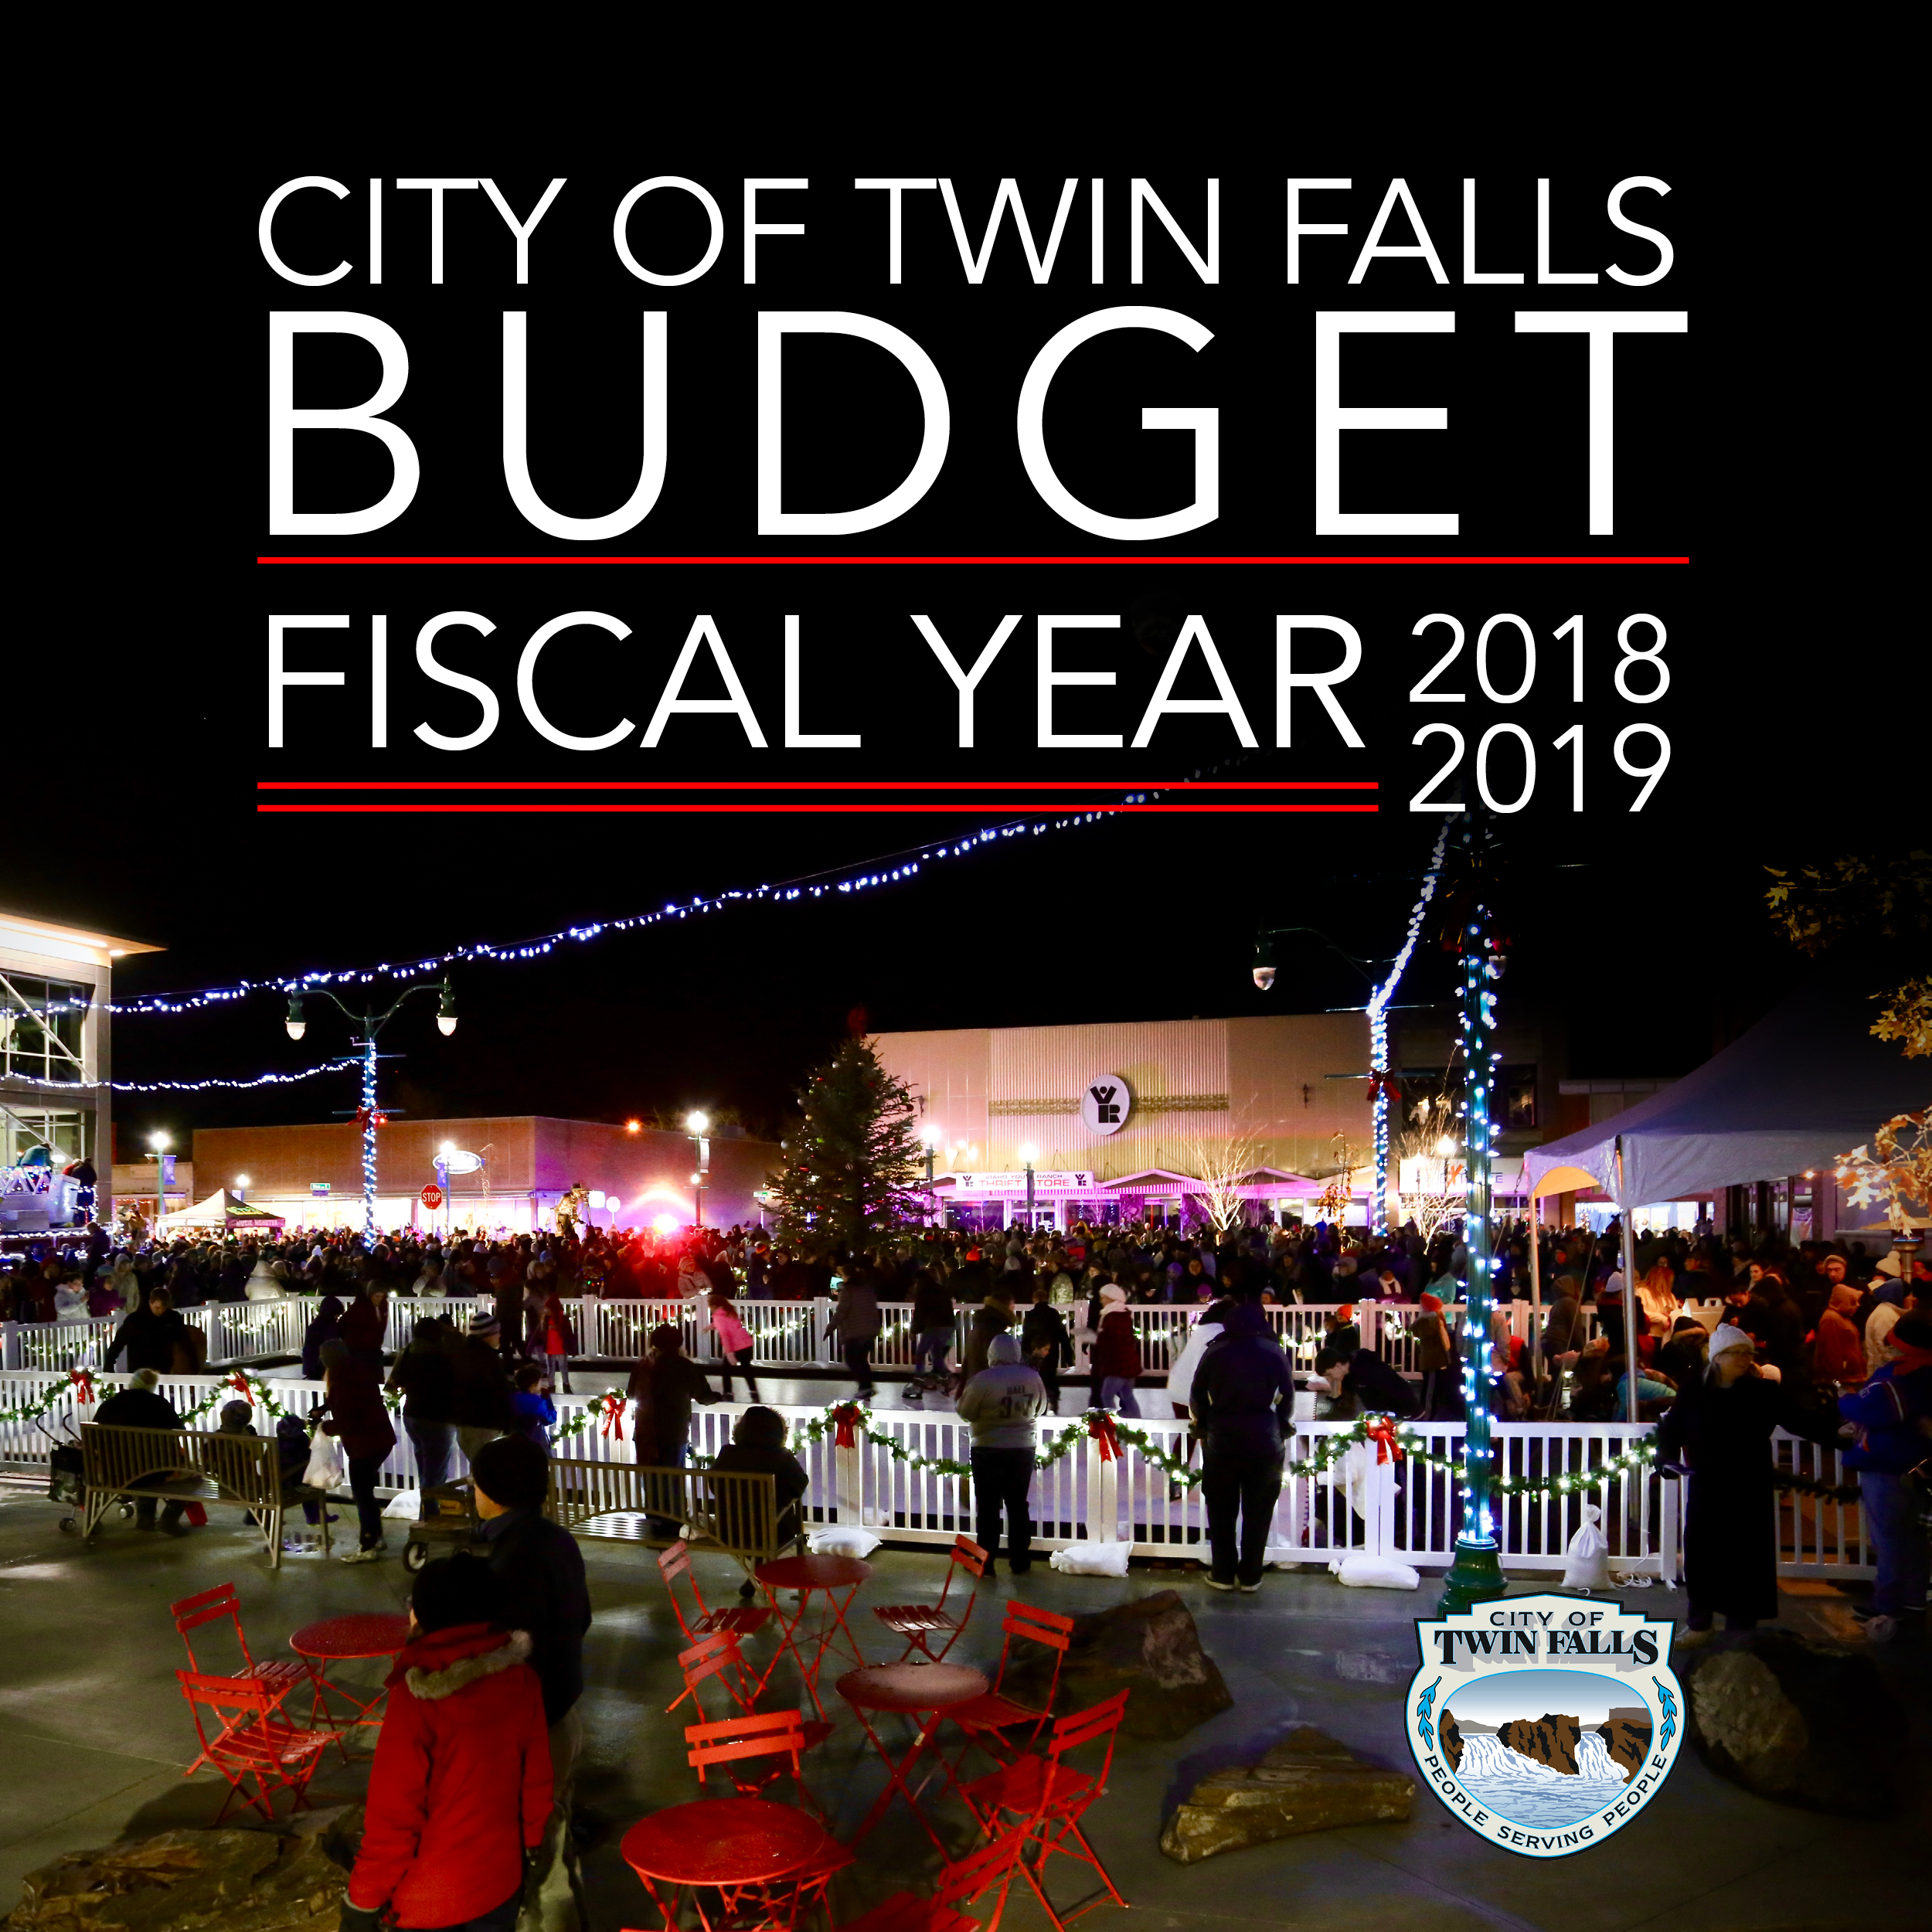 17b90fdd5 City of Twin Falls, Idaho Adopted Budget Fiscal Year 2018-2019